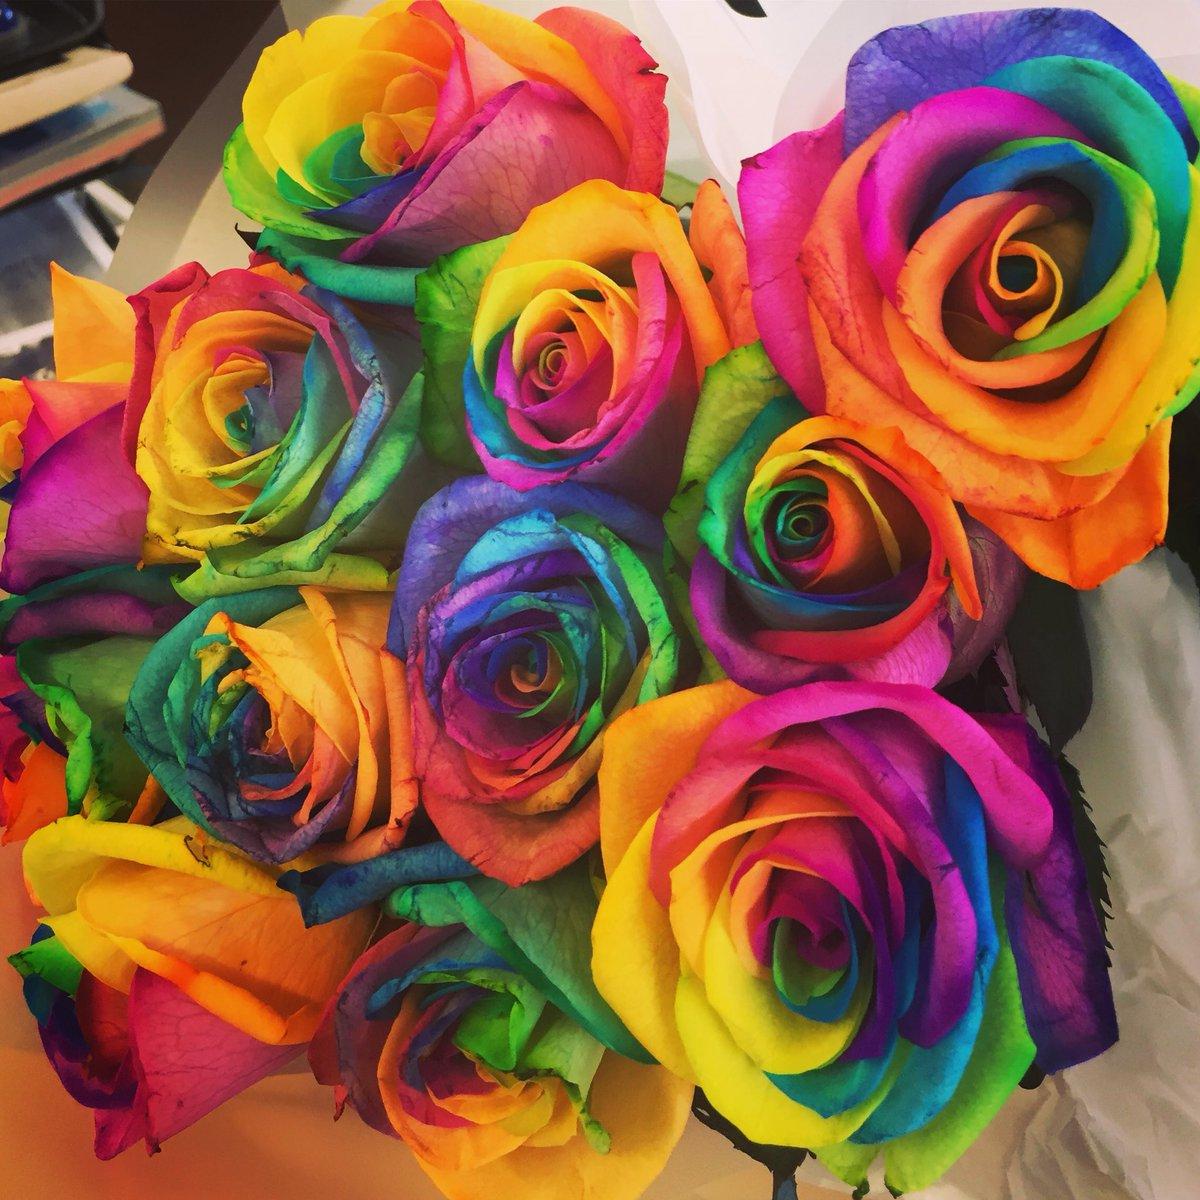 Justine Ablett On Twitter My Beautiful Rainbow Roses Beautiful